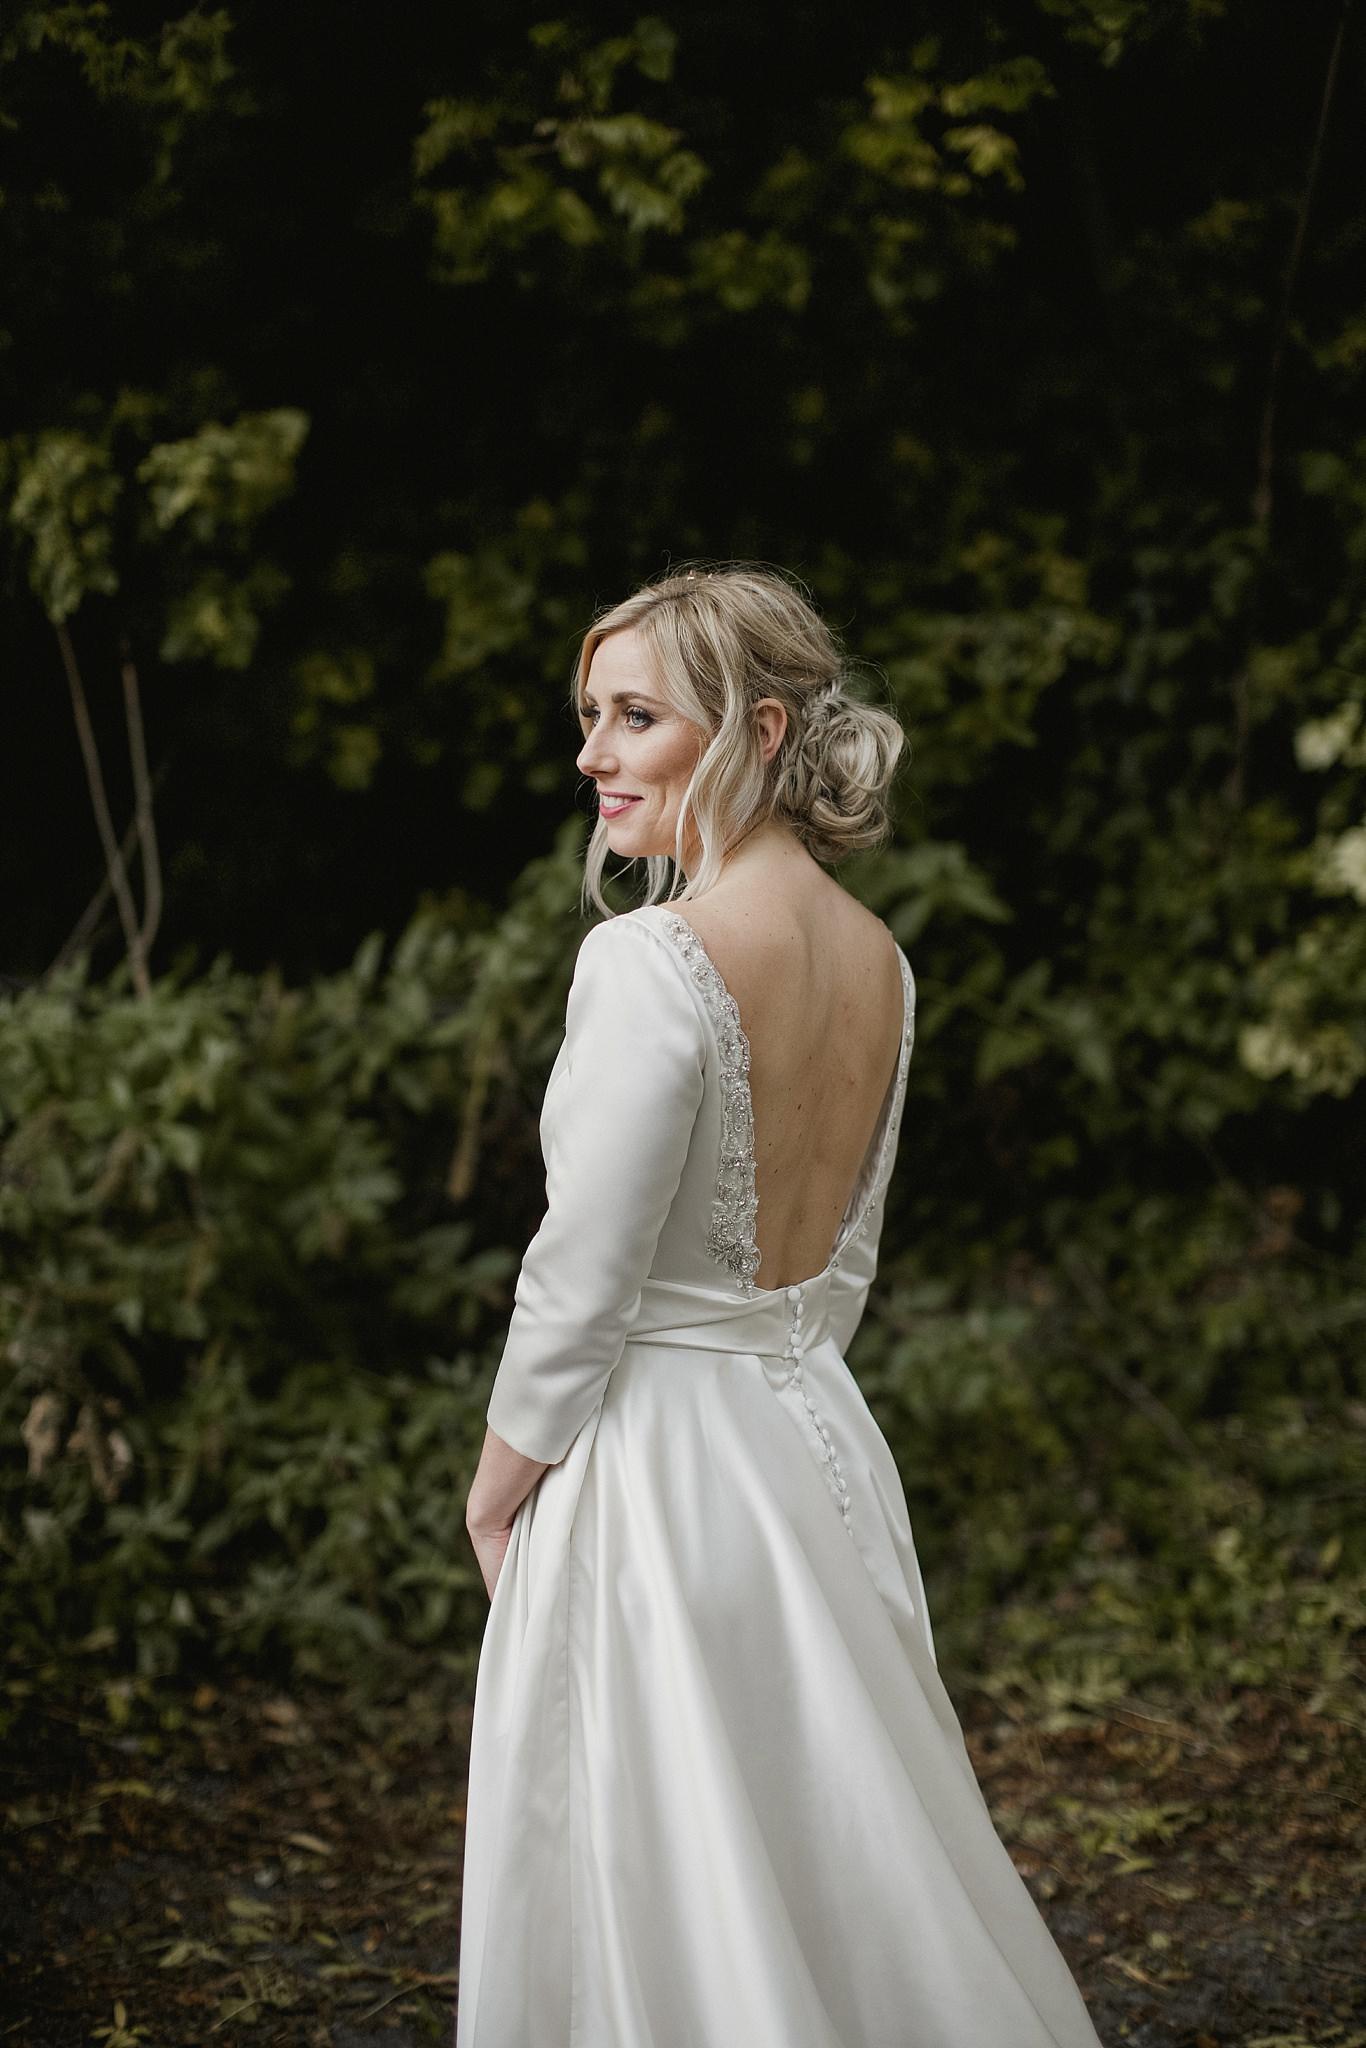 Sheffield_Wedding_Photography_0035.jpg